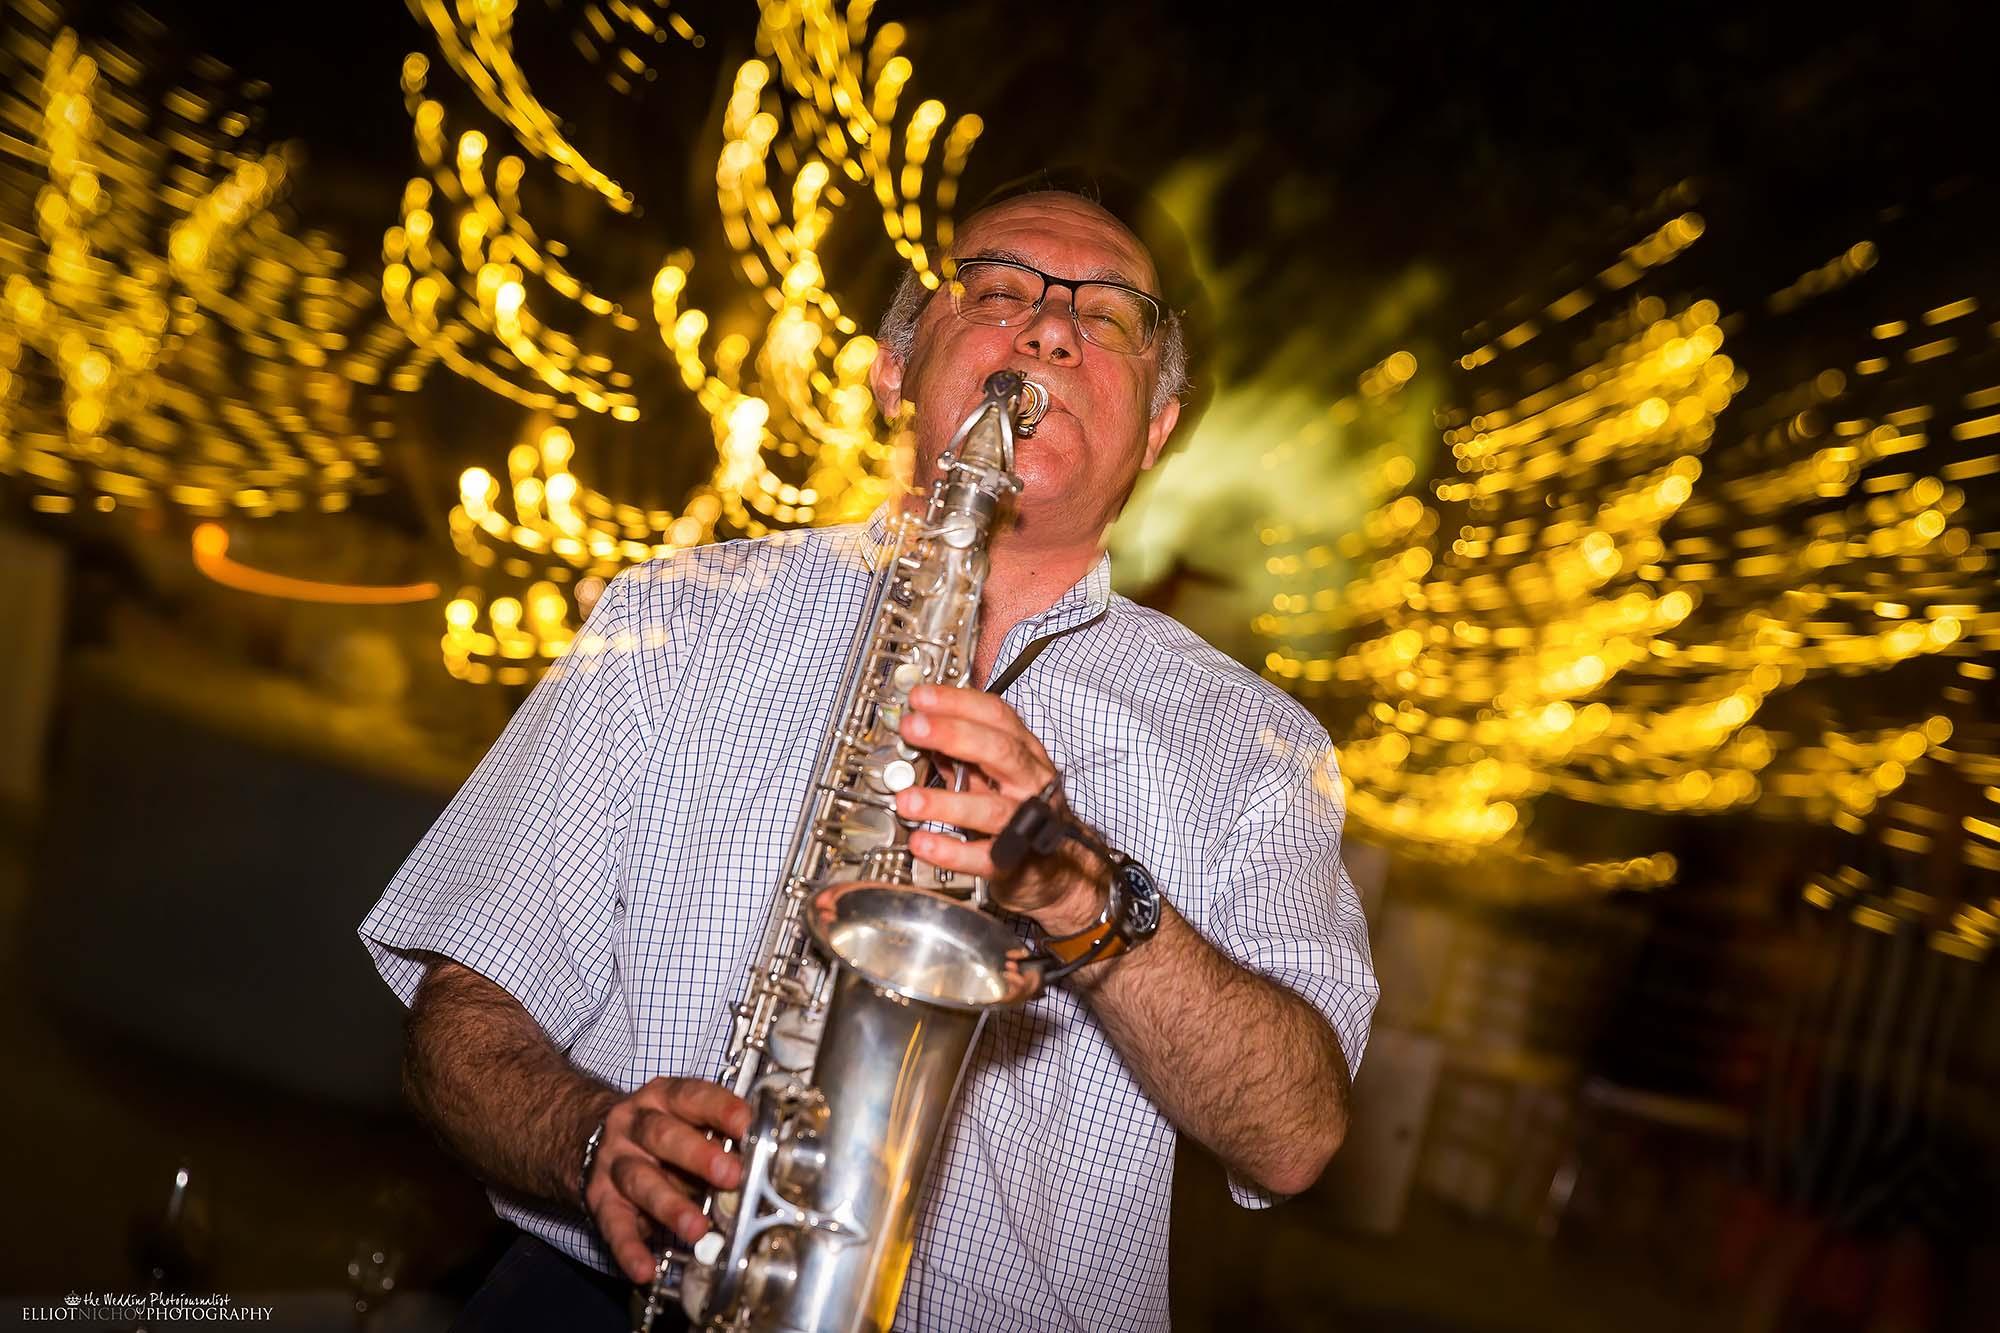 Wedding musician plays his Sax during the wedding reception. Photo by North East wedding photographer Elliot Nichol.